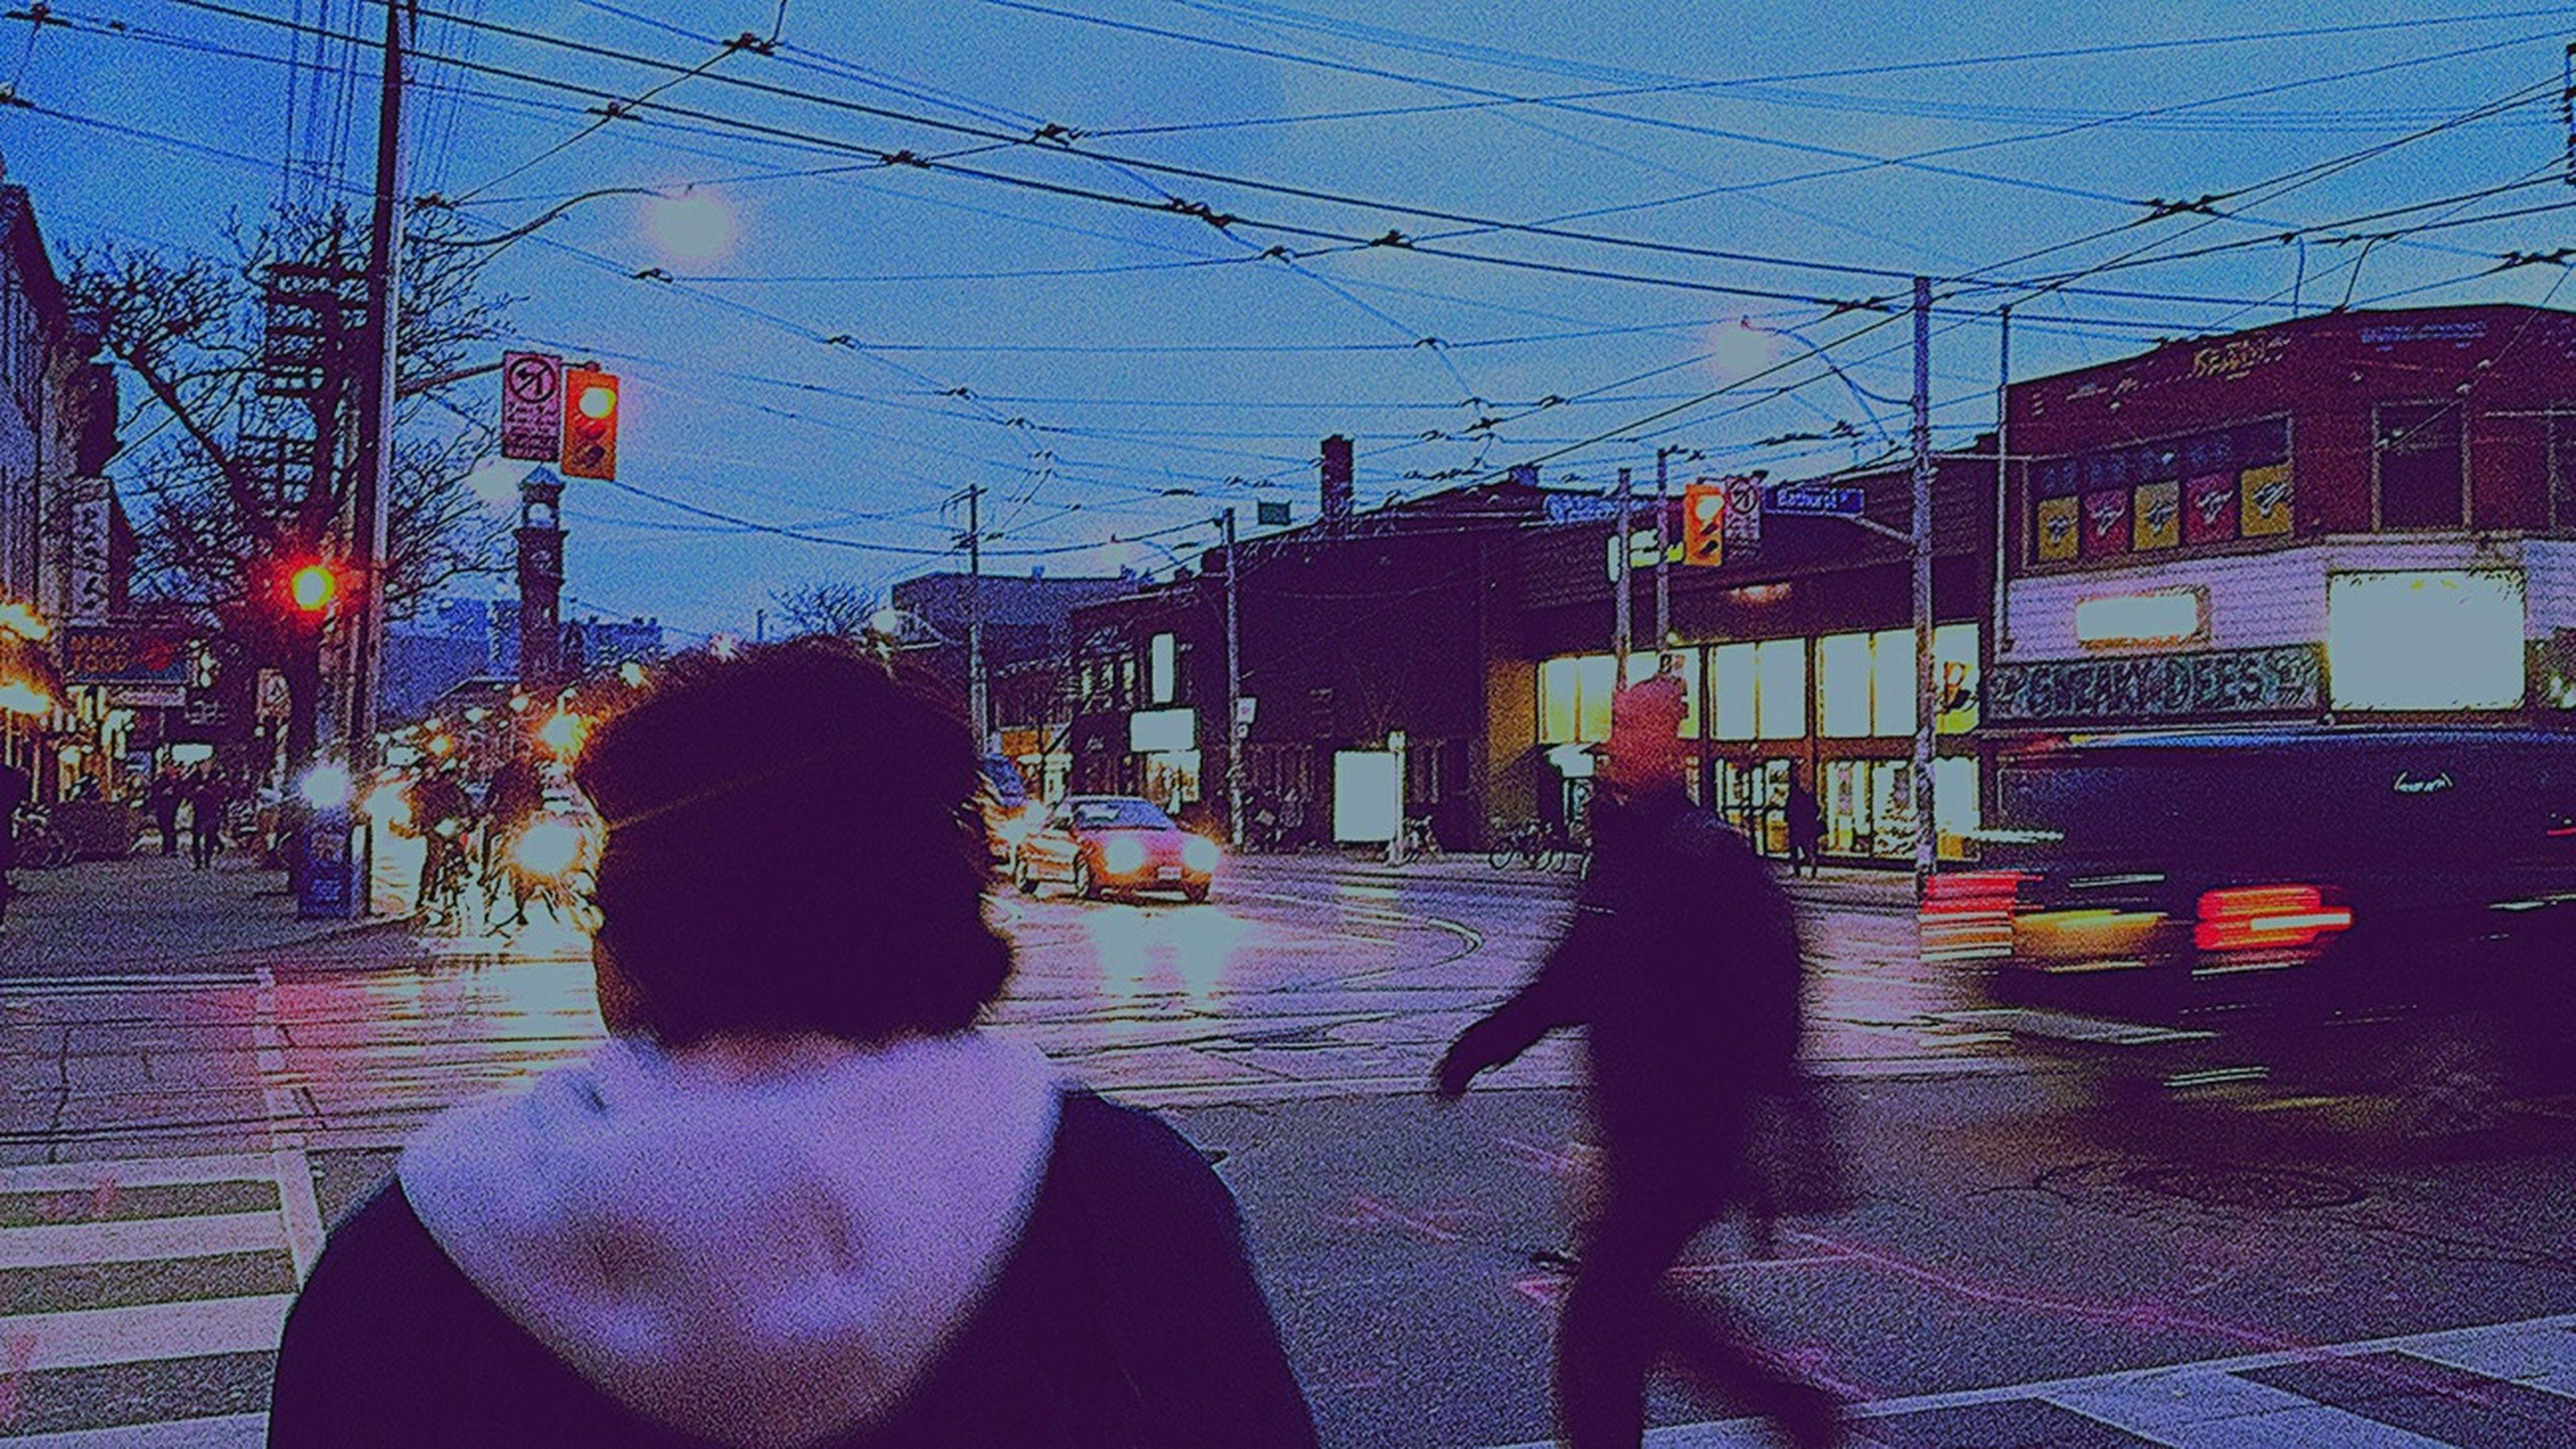 building exterior, architecture, built structure, street, city, power line, street light, sky, road, sidewalk, electricity pylon, transportation, city street, city life, residential structure, sunlight, residential building, dusk, outdoors, building